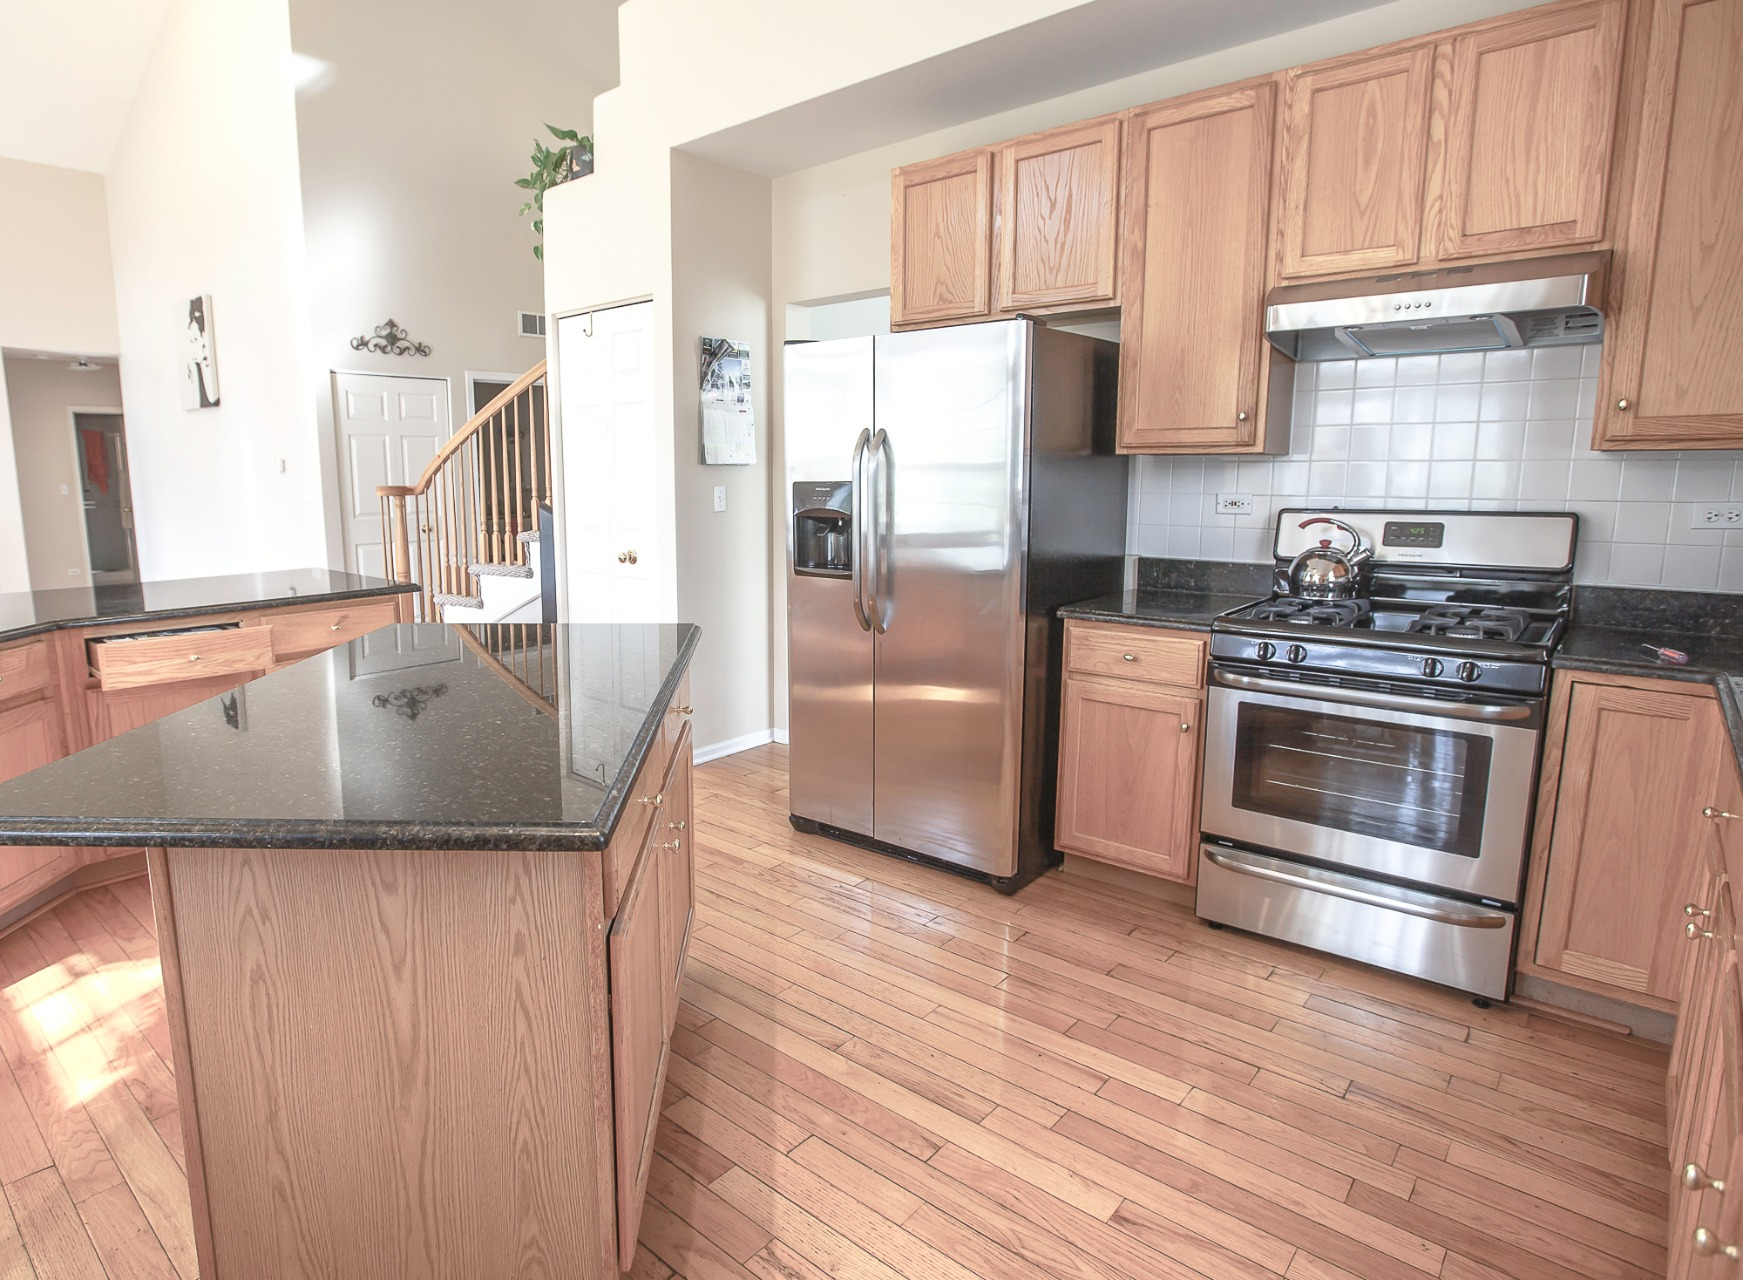 oak kitchen islands ikea cabinet doors 热帖 - weee! 华人生鲜第一站